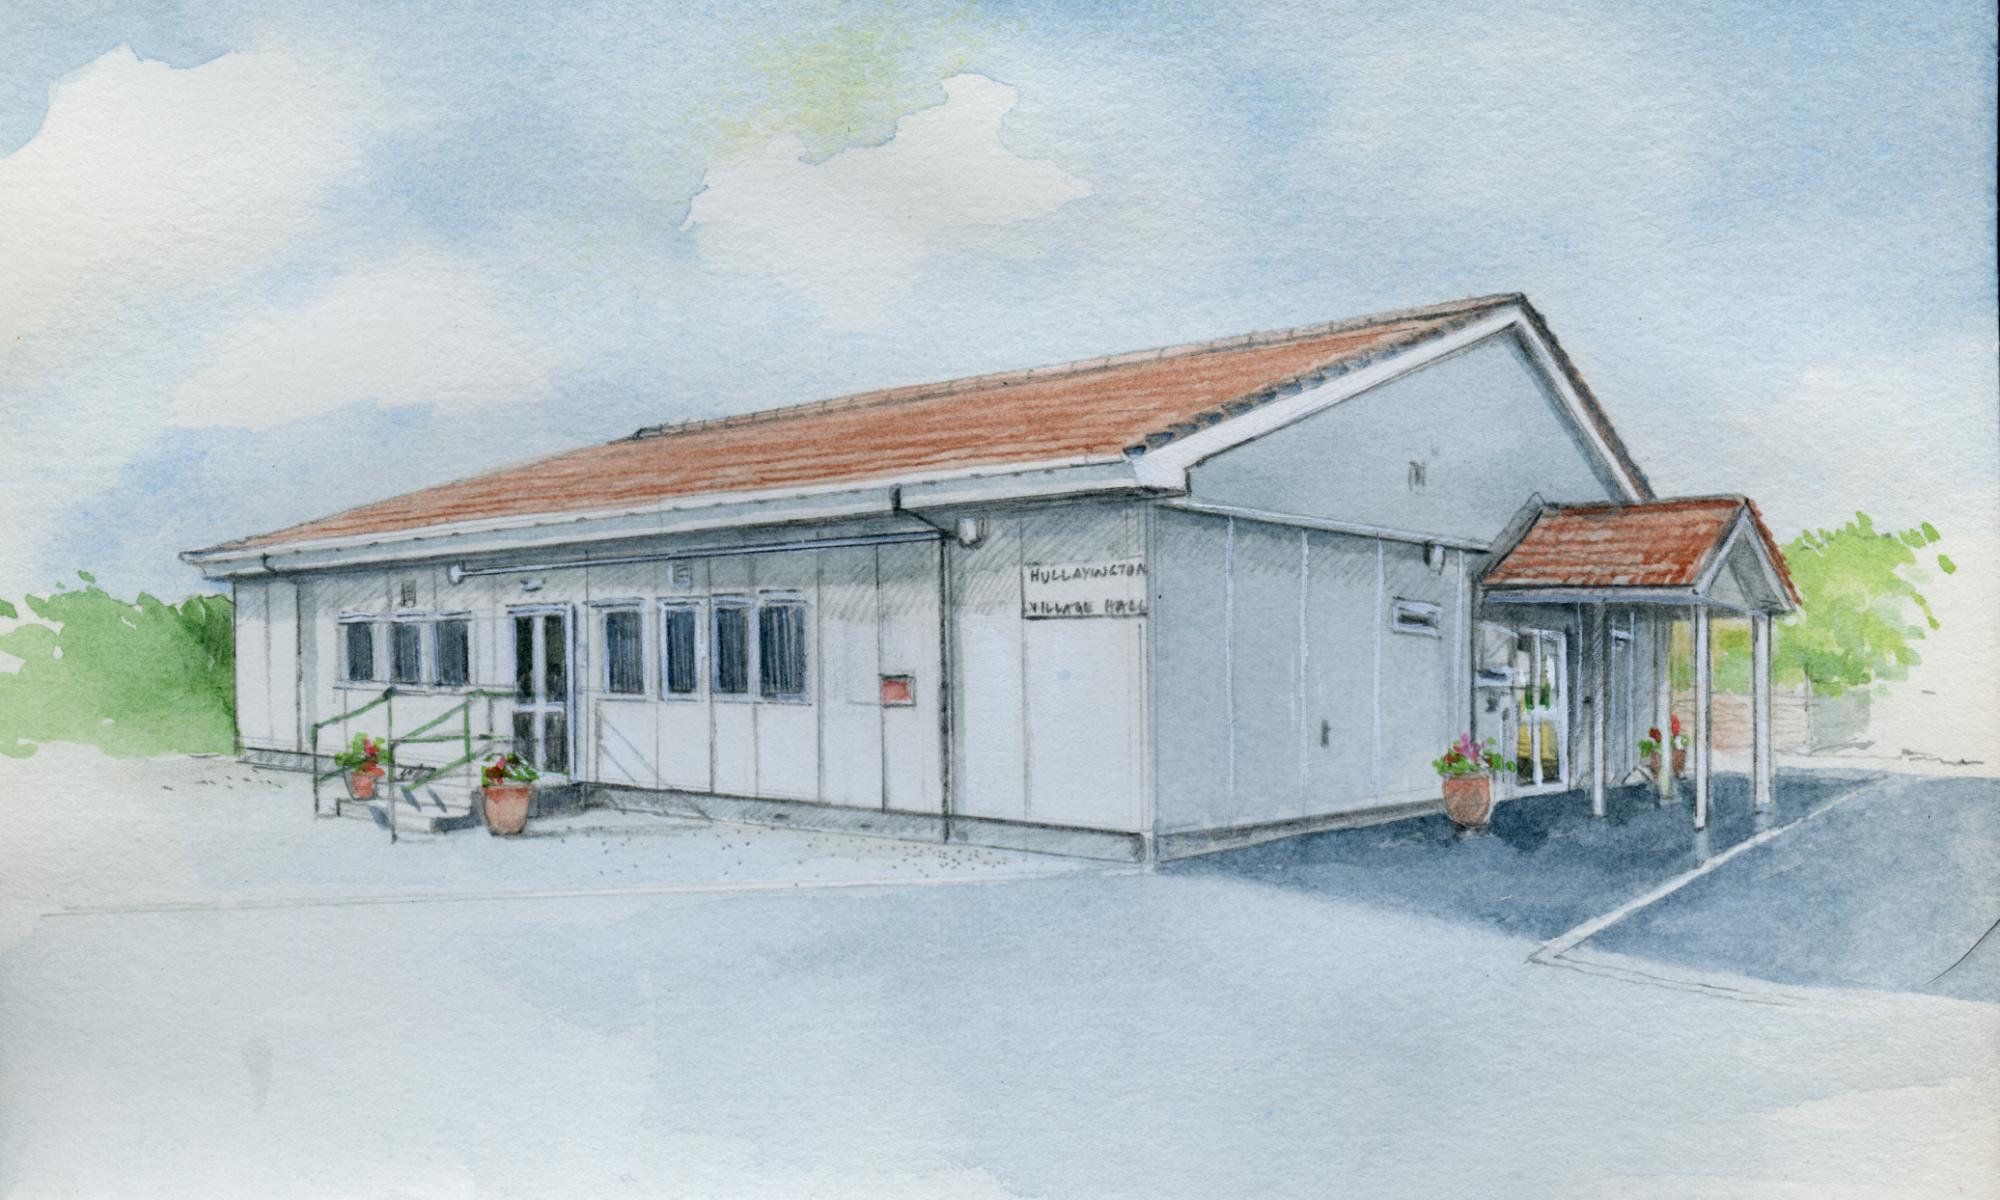 Hullavington Village Hall